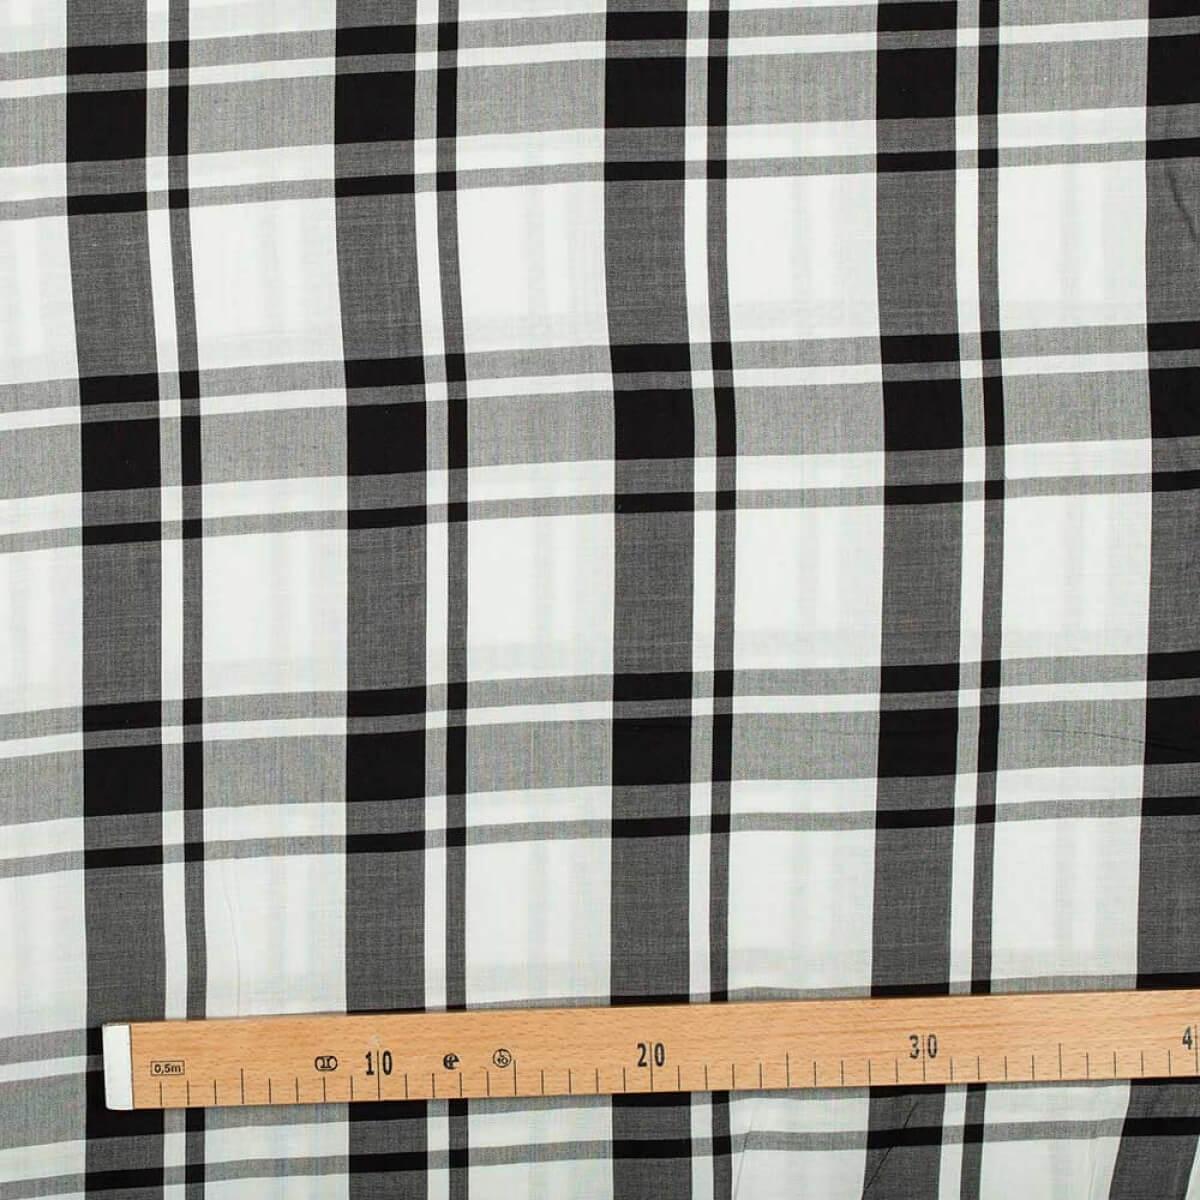 tissu viscose carreaux noir blanc. Black Bedroom Furniture Sets. Home Design Ideas